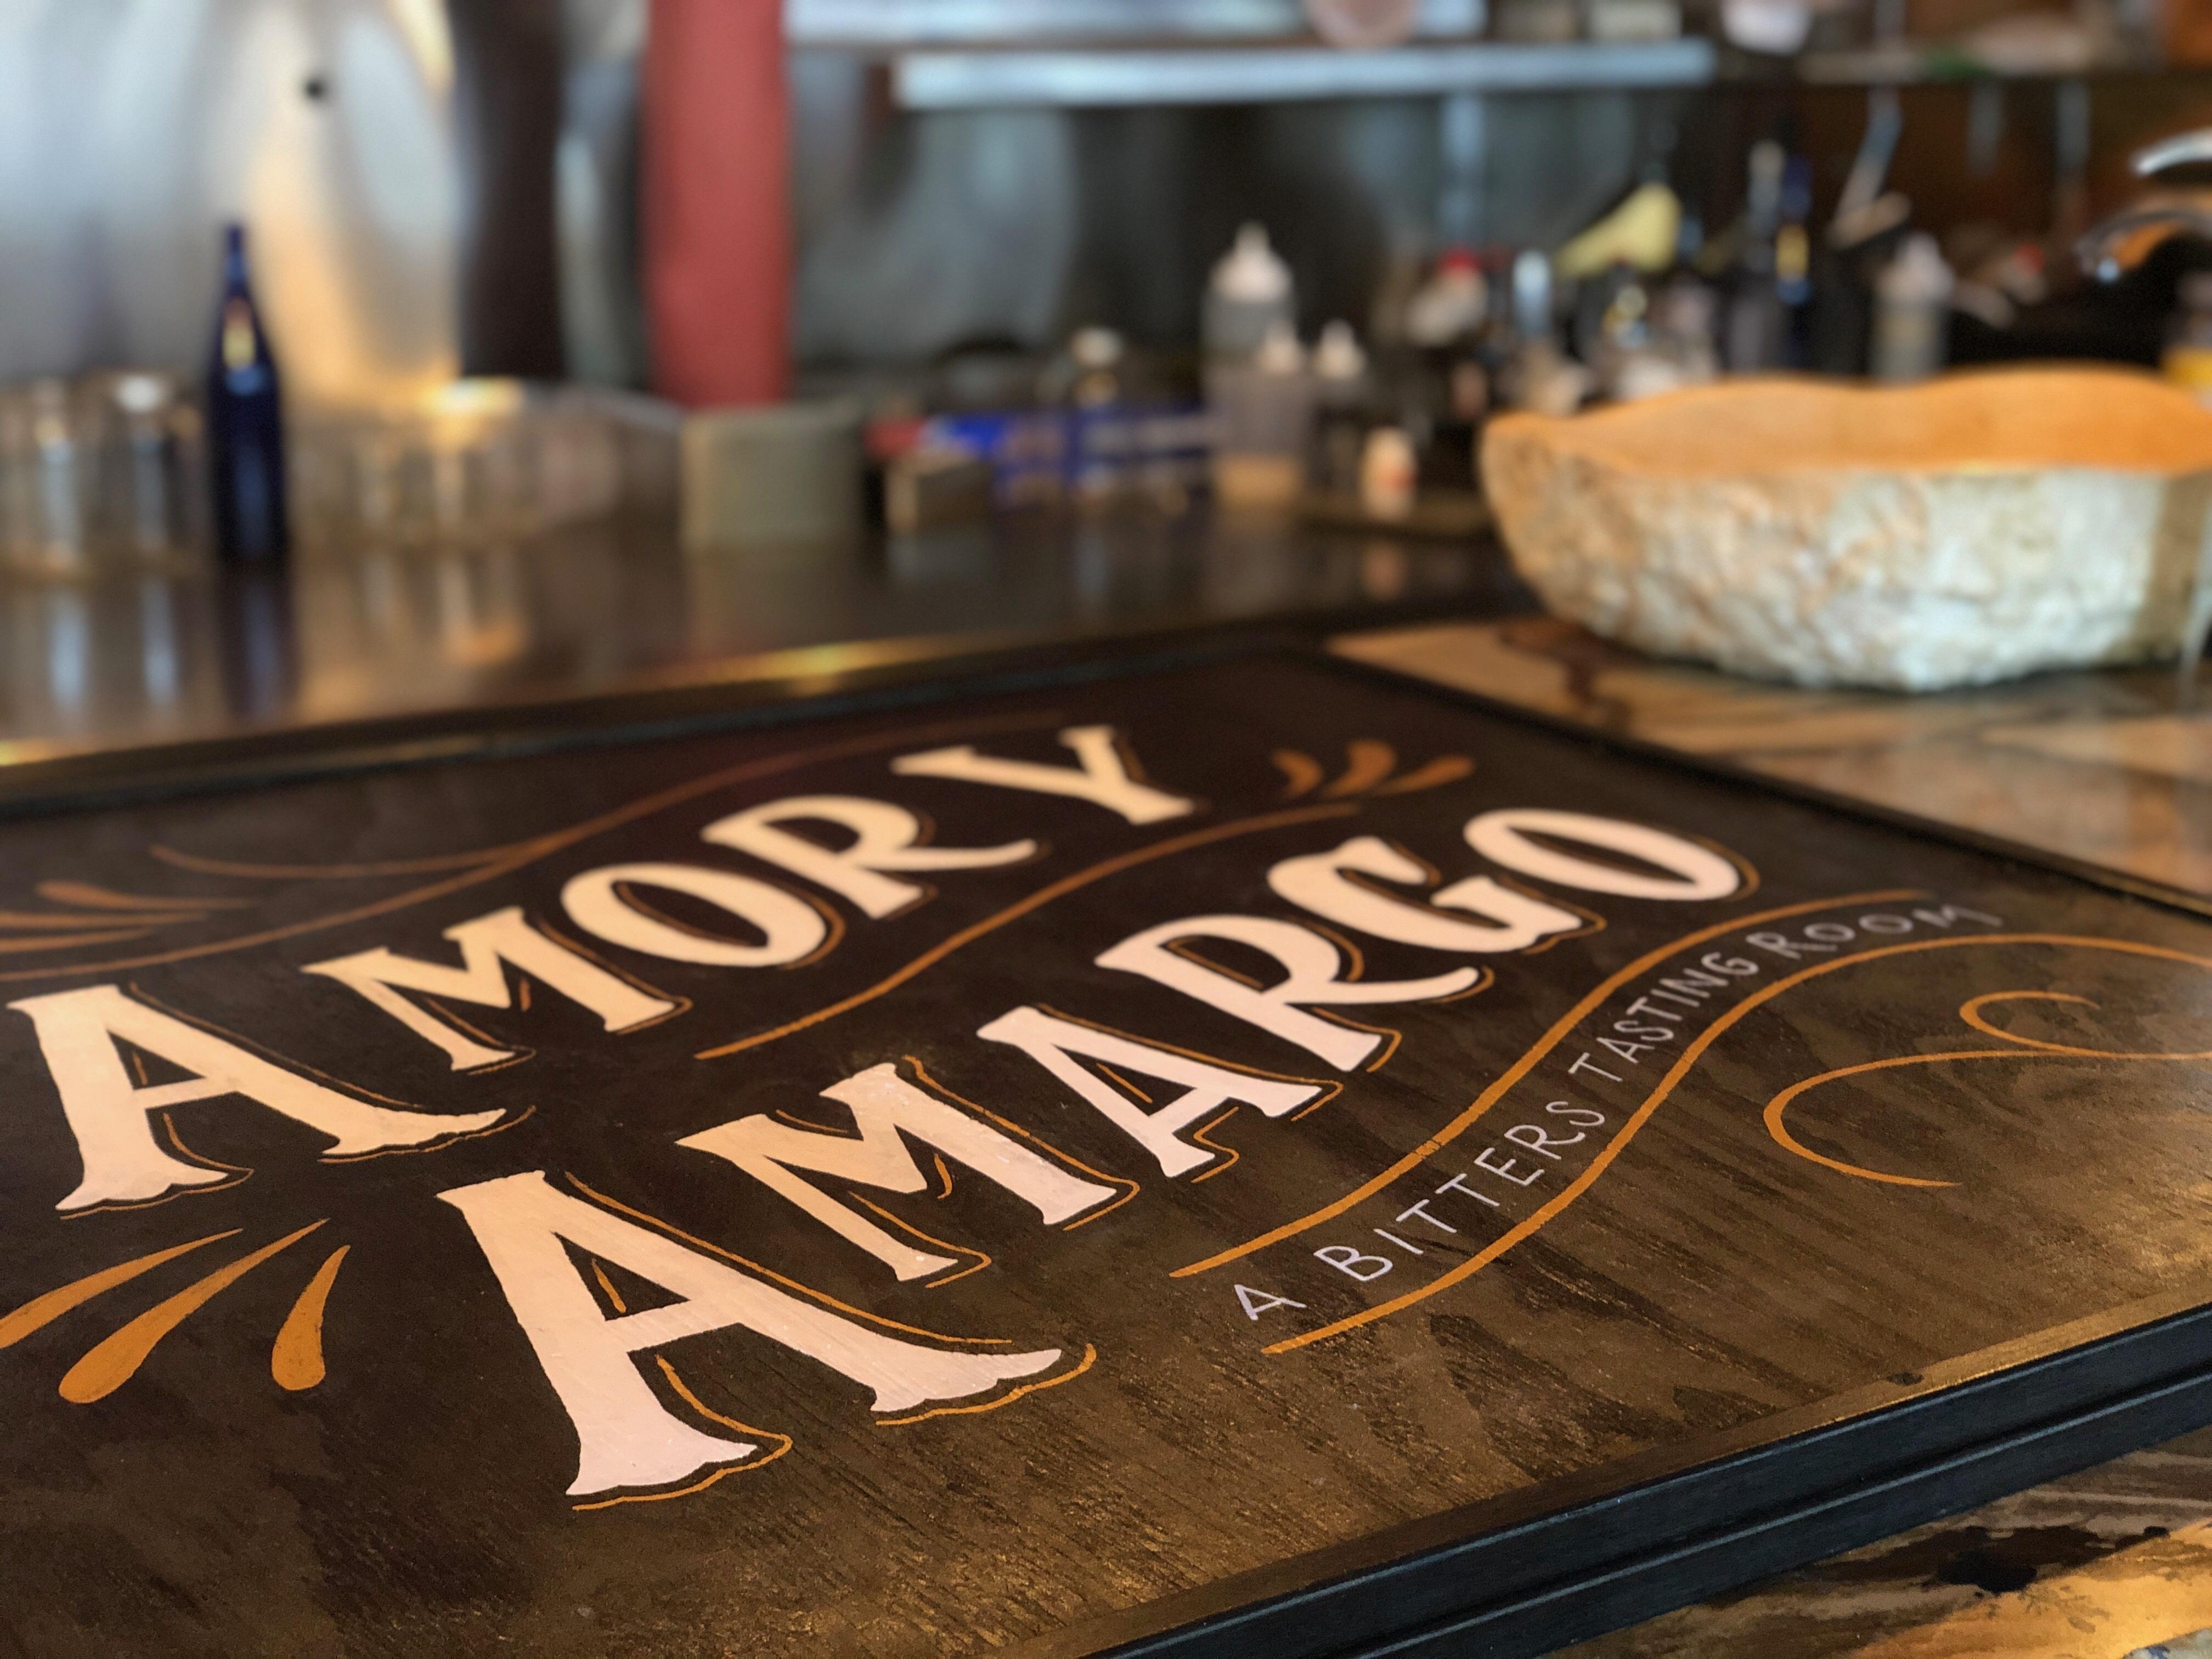 Cocktail Destination Amor Y Amargo Is Opening a Bigger Location in Williamsburg